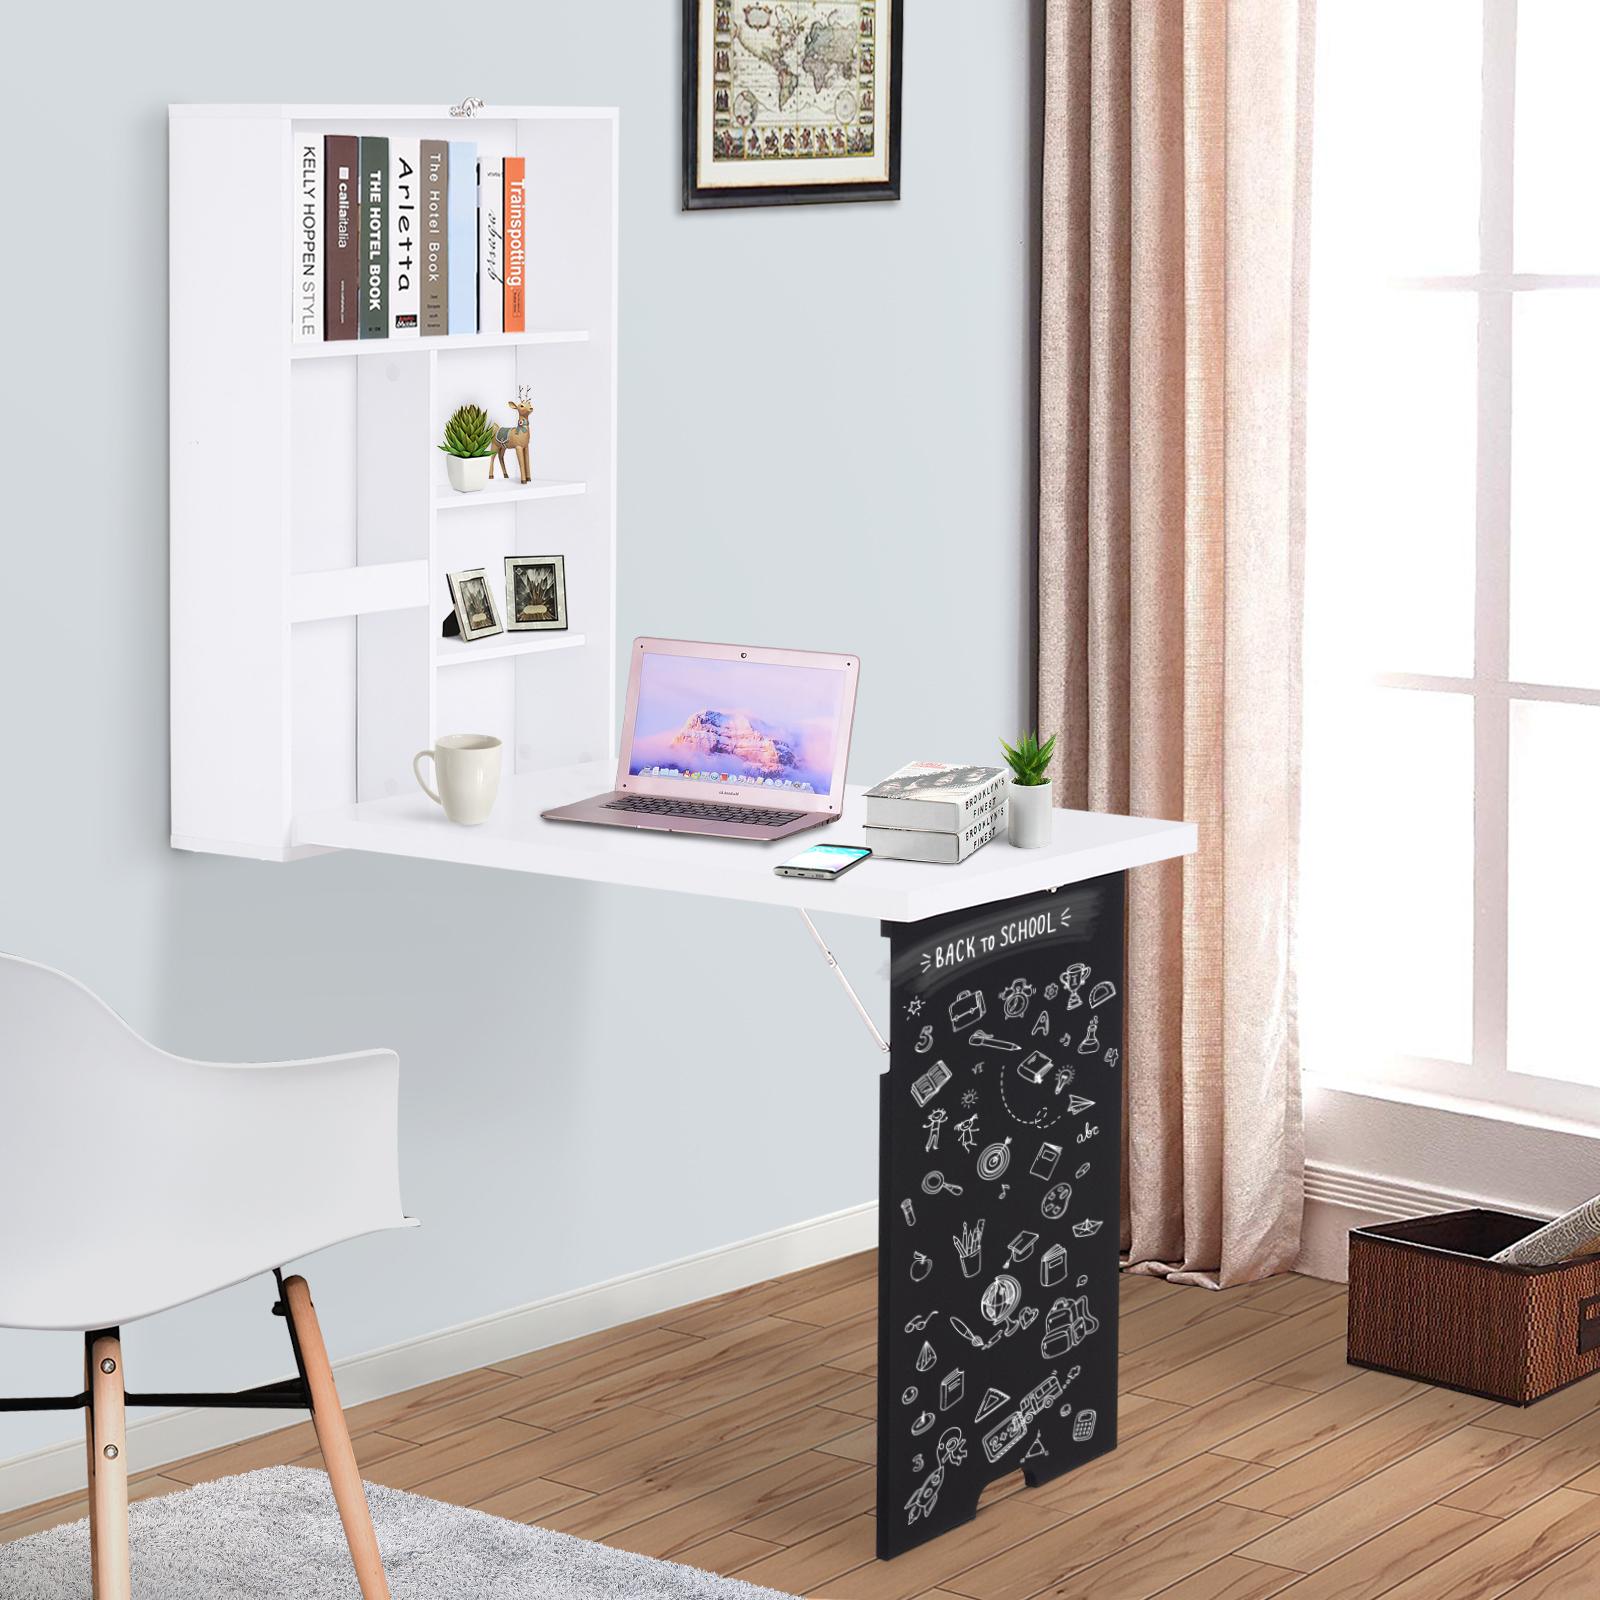 - Wall Mount Folding Computer Desk W/ Storage, Blackboard And Simple